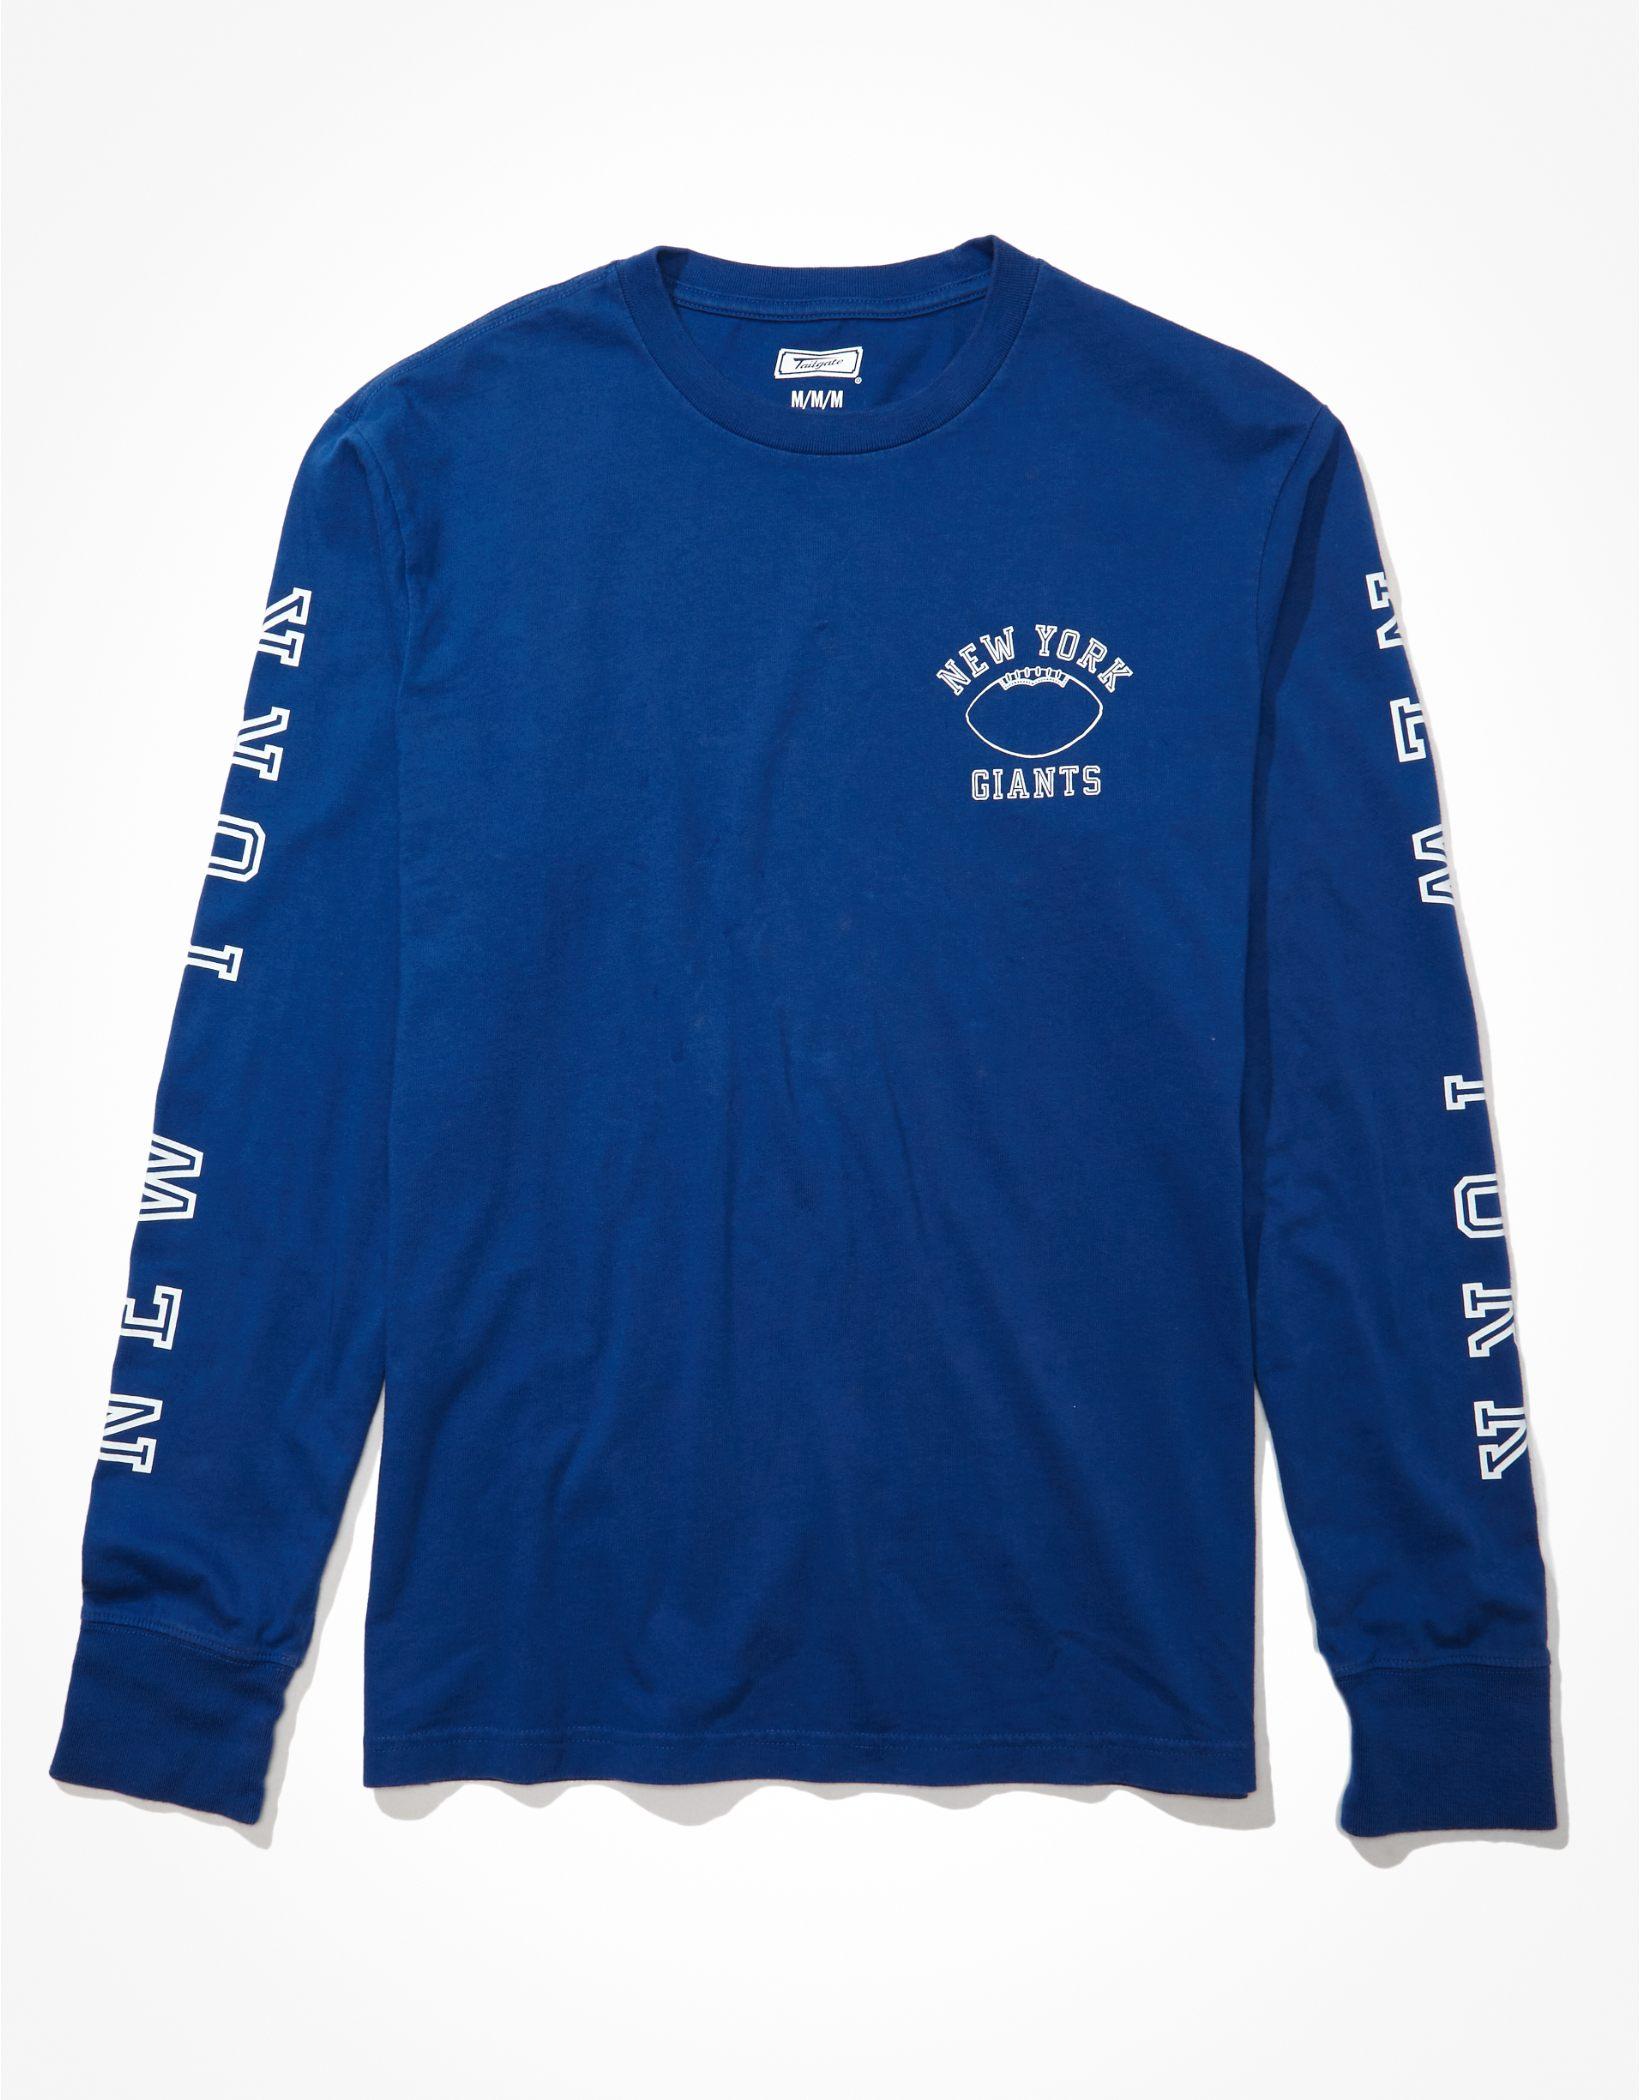 Tailgate Men's New York Giants Long-Sleeve Graphic T-Shirt